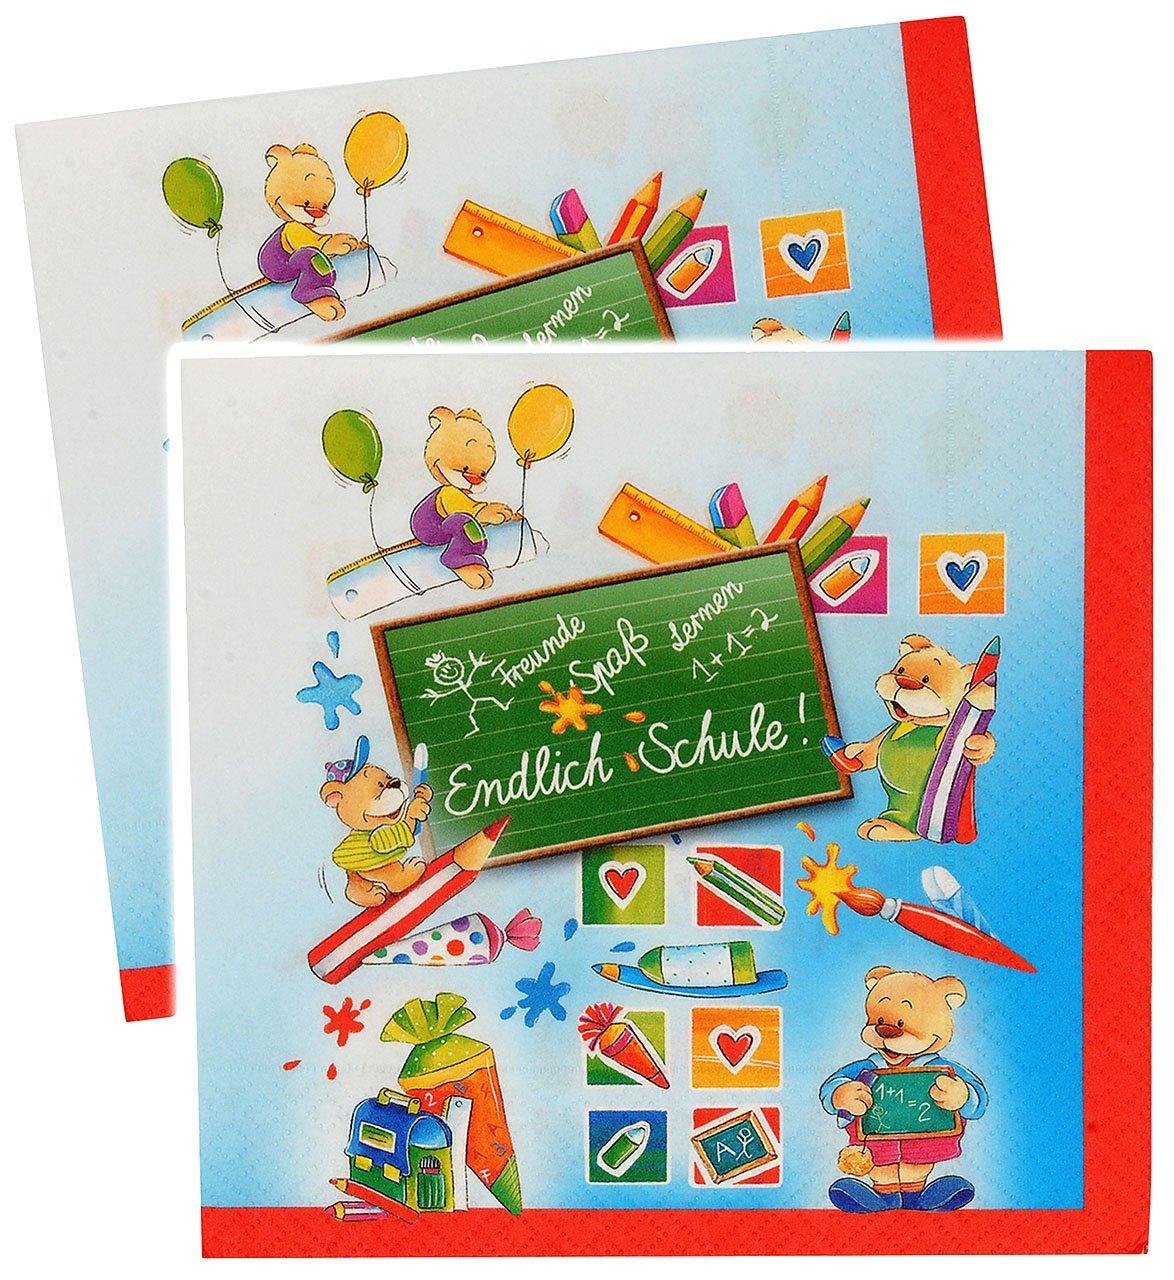 123 ABC Sticker Junge Dekoration Einschulung Schulstart basteln Schulanfang